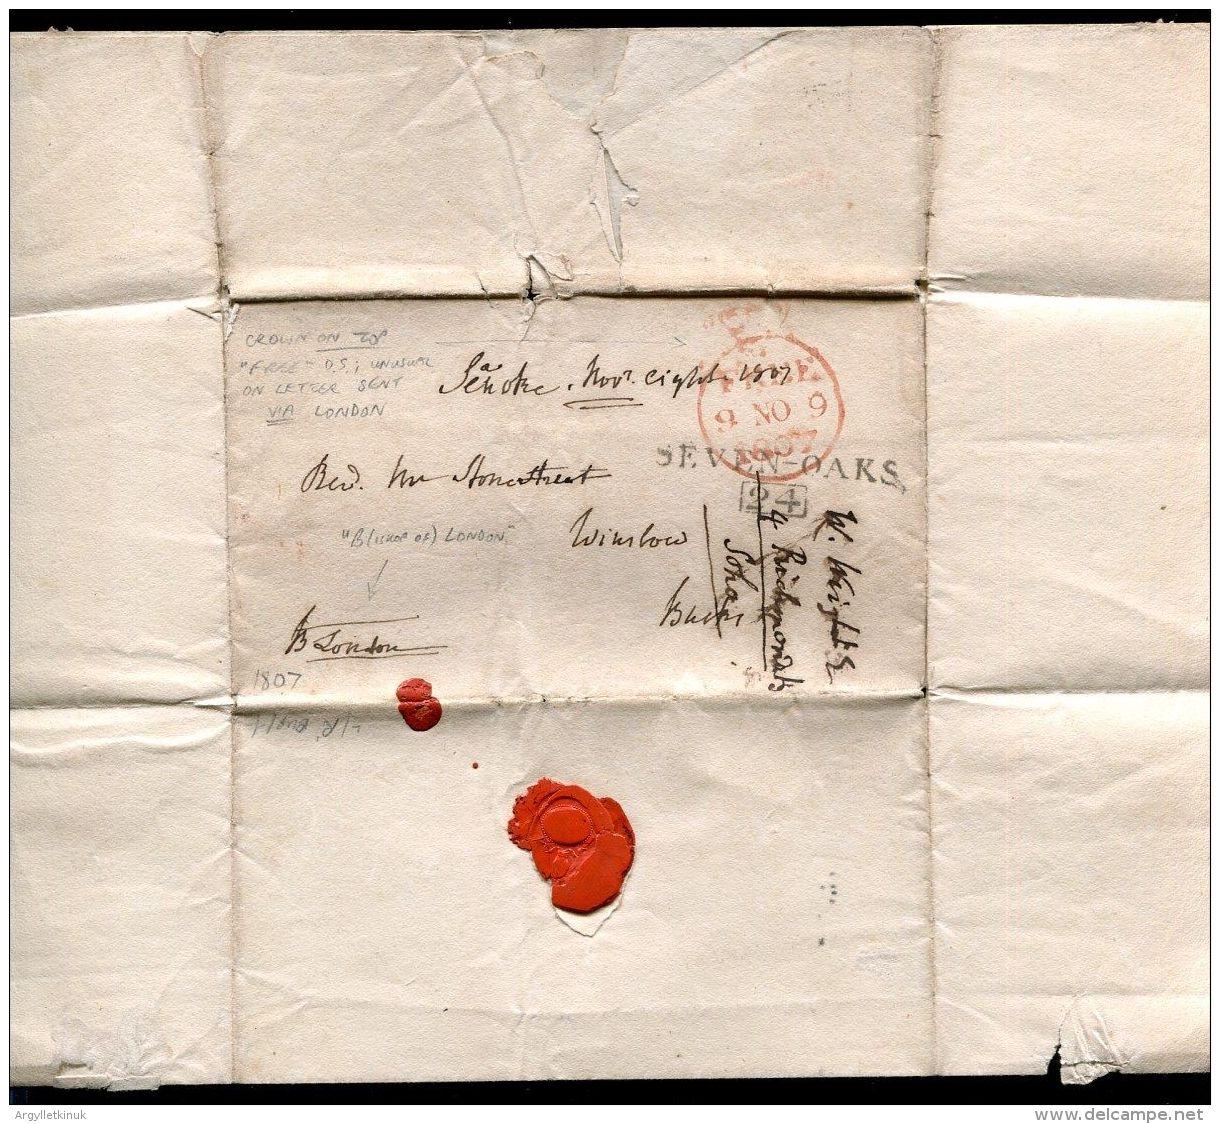 GREAT BRITAIN PARLIAMENTARY FREE BISHOP OF LONDON SIGNATURE SEVENOAKS SMITHFIELD - Postmark Collection